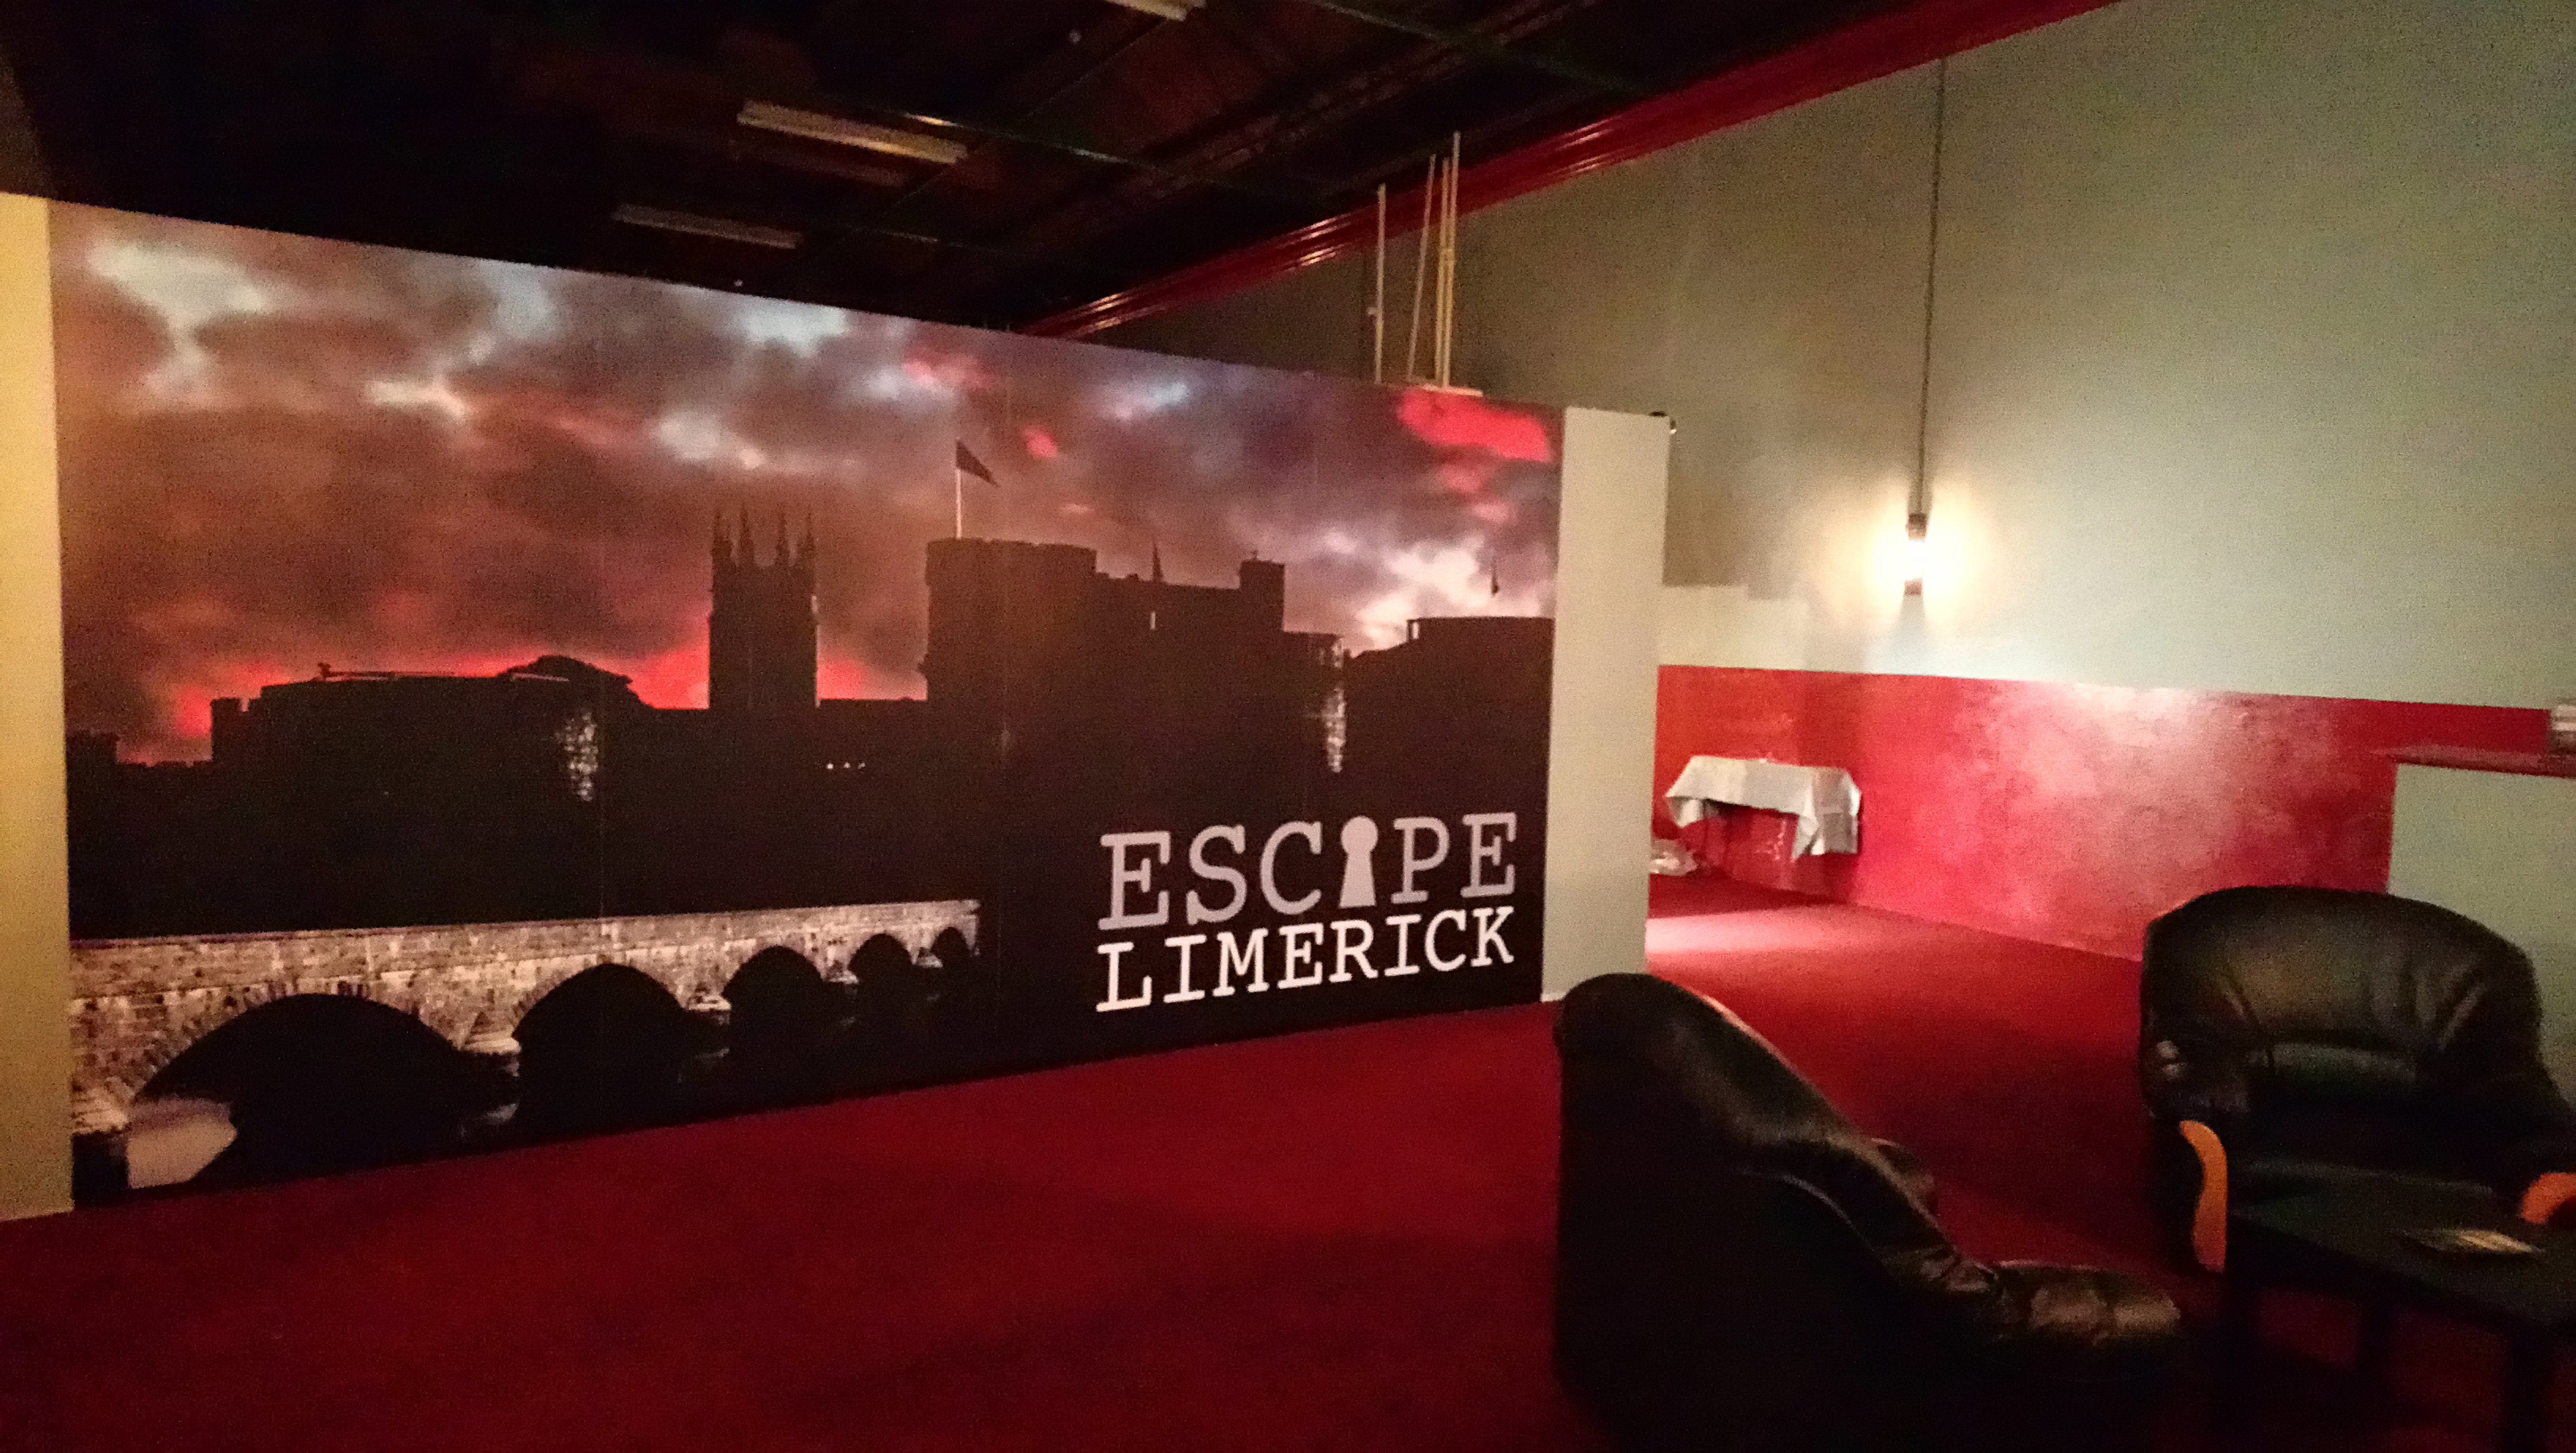 Escape Limerick Ireland Top Tips Before You Go With Photos